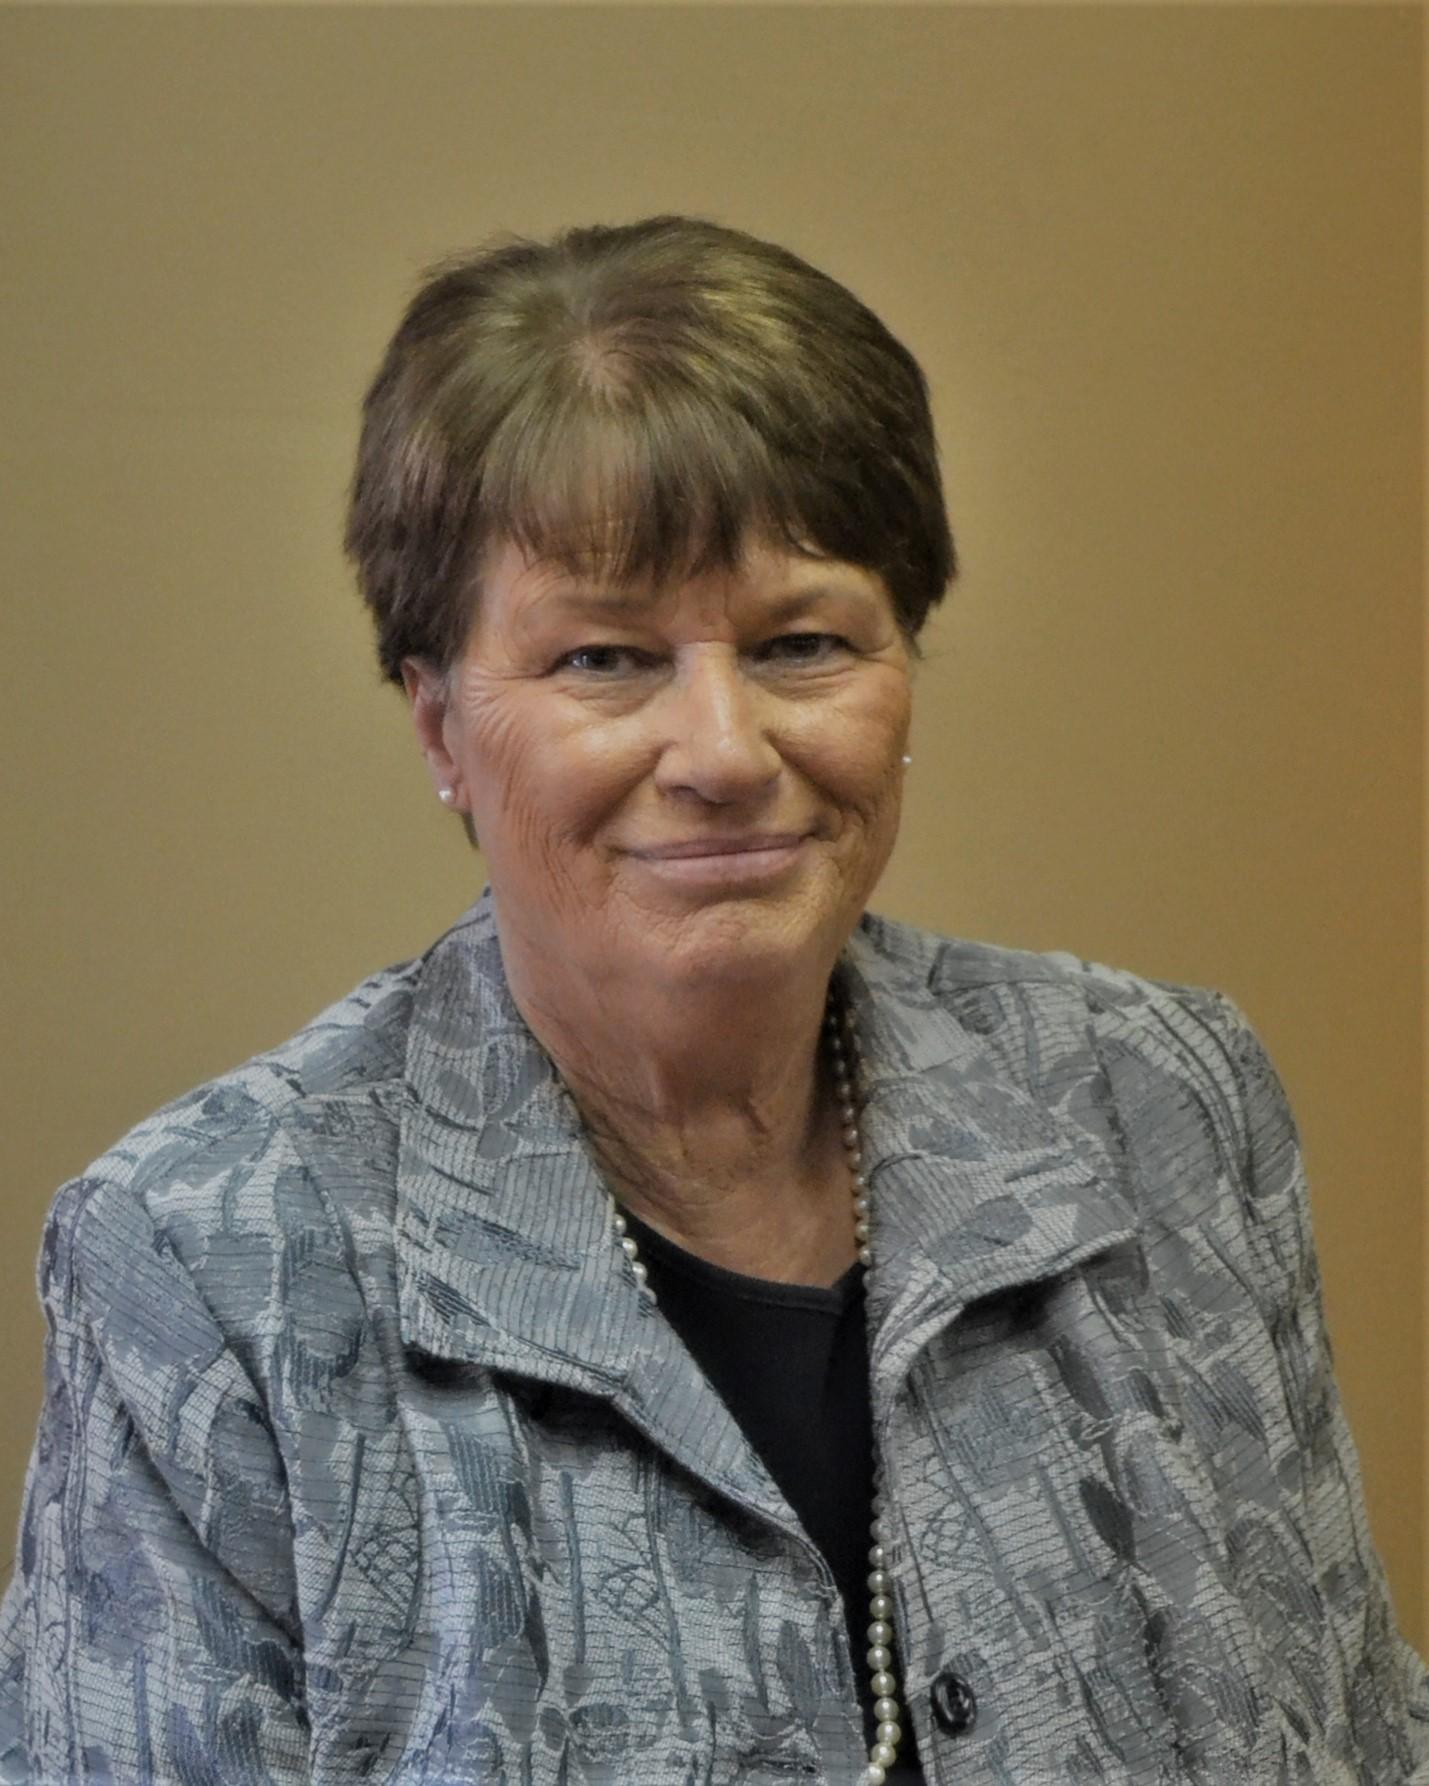 Deborah Campbell Municipal Court Judge